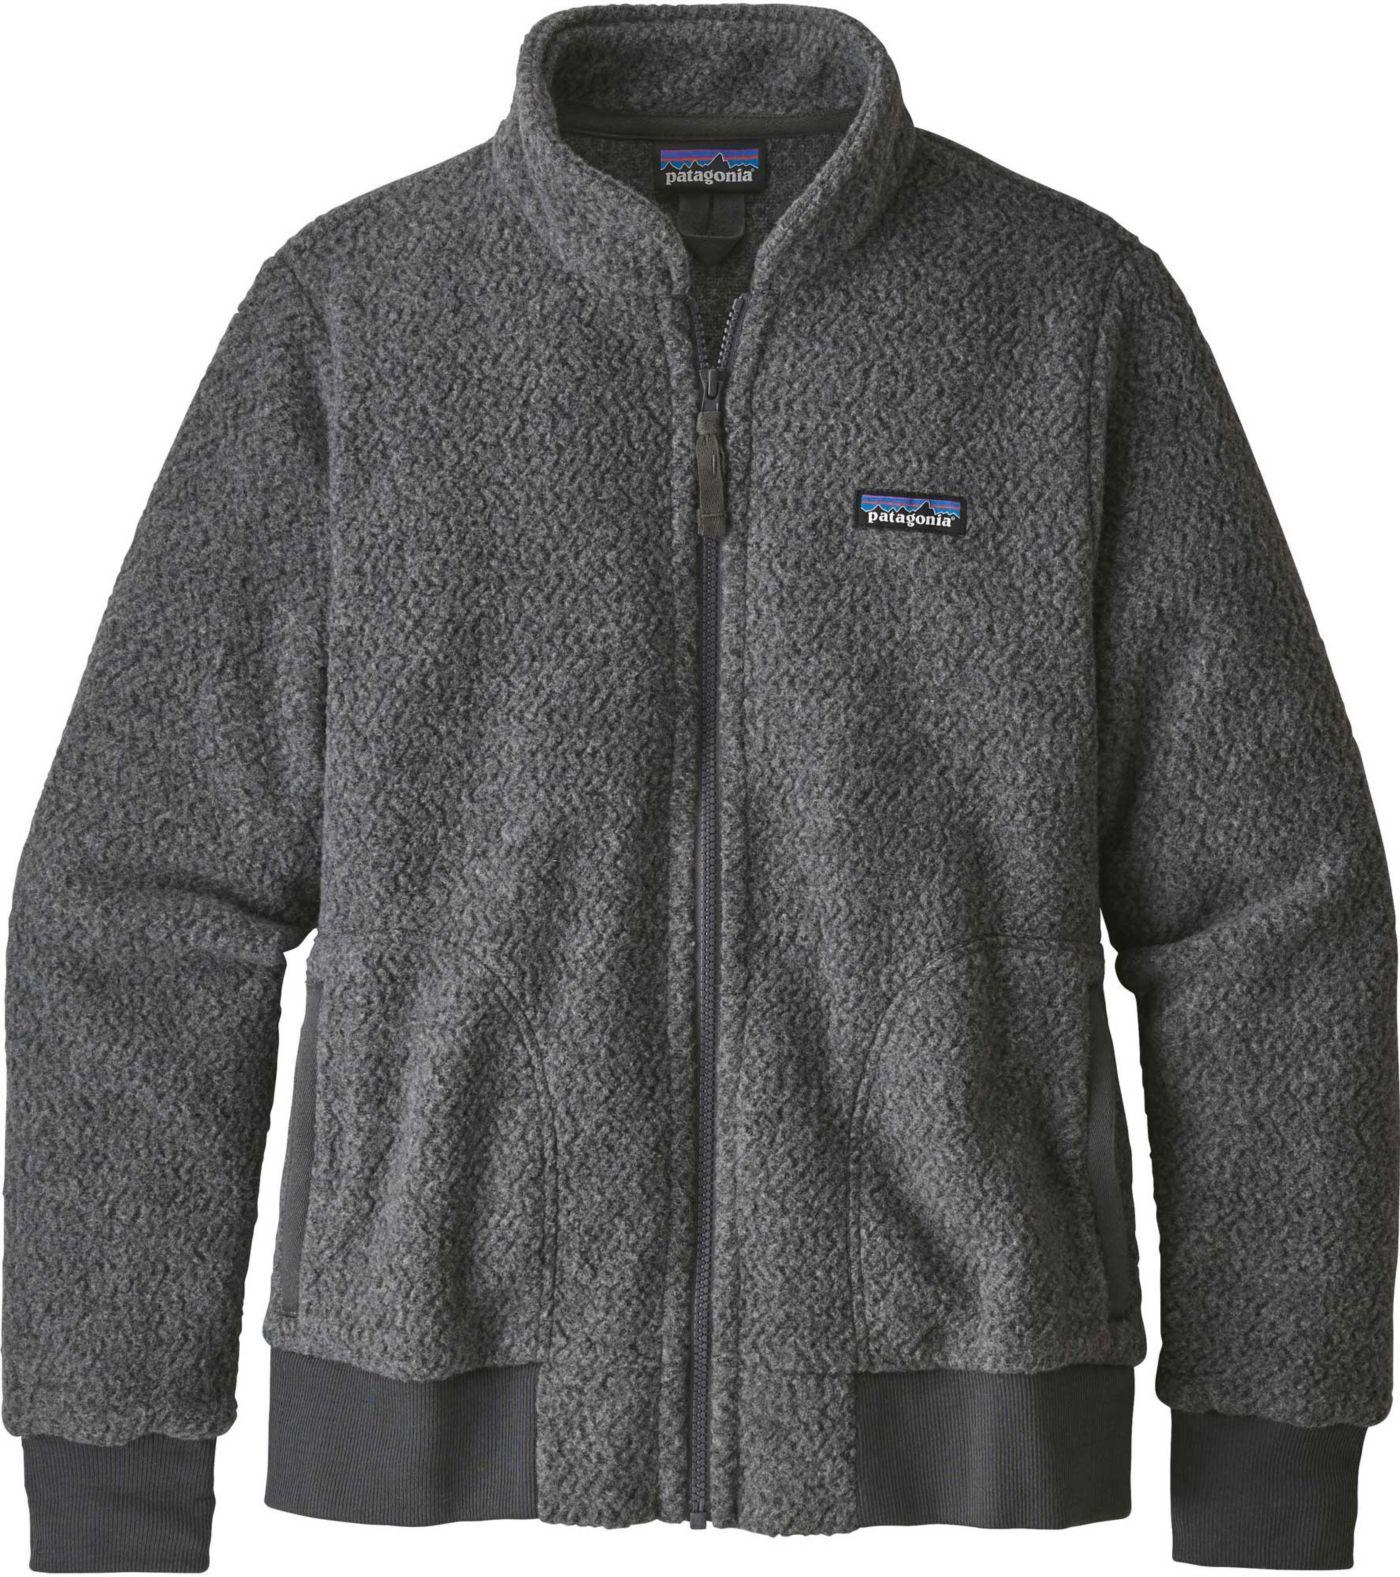 Patagonia Women's Woolyester Fleece Jacket